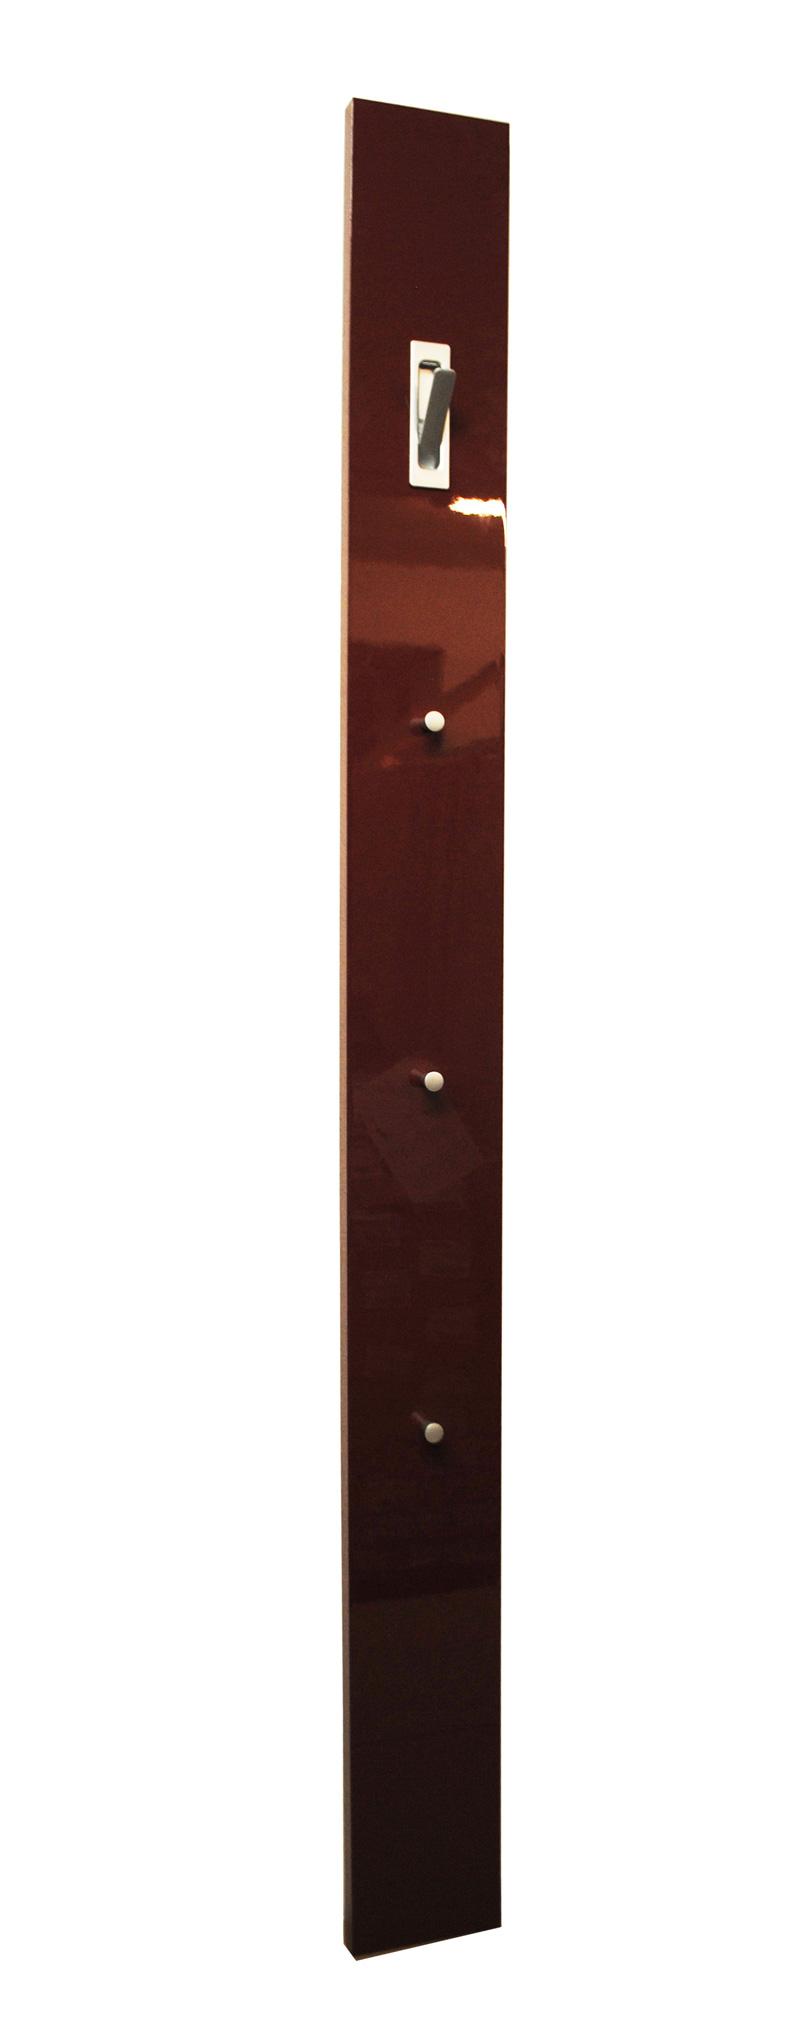 Garderoben Garderoben-Paneel rot Hochglanz UVP 79,90 NEU & OVP